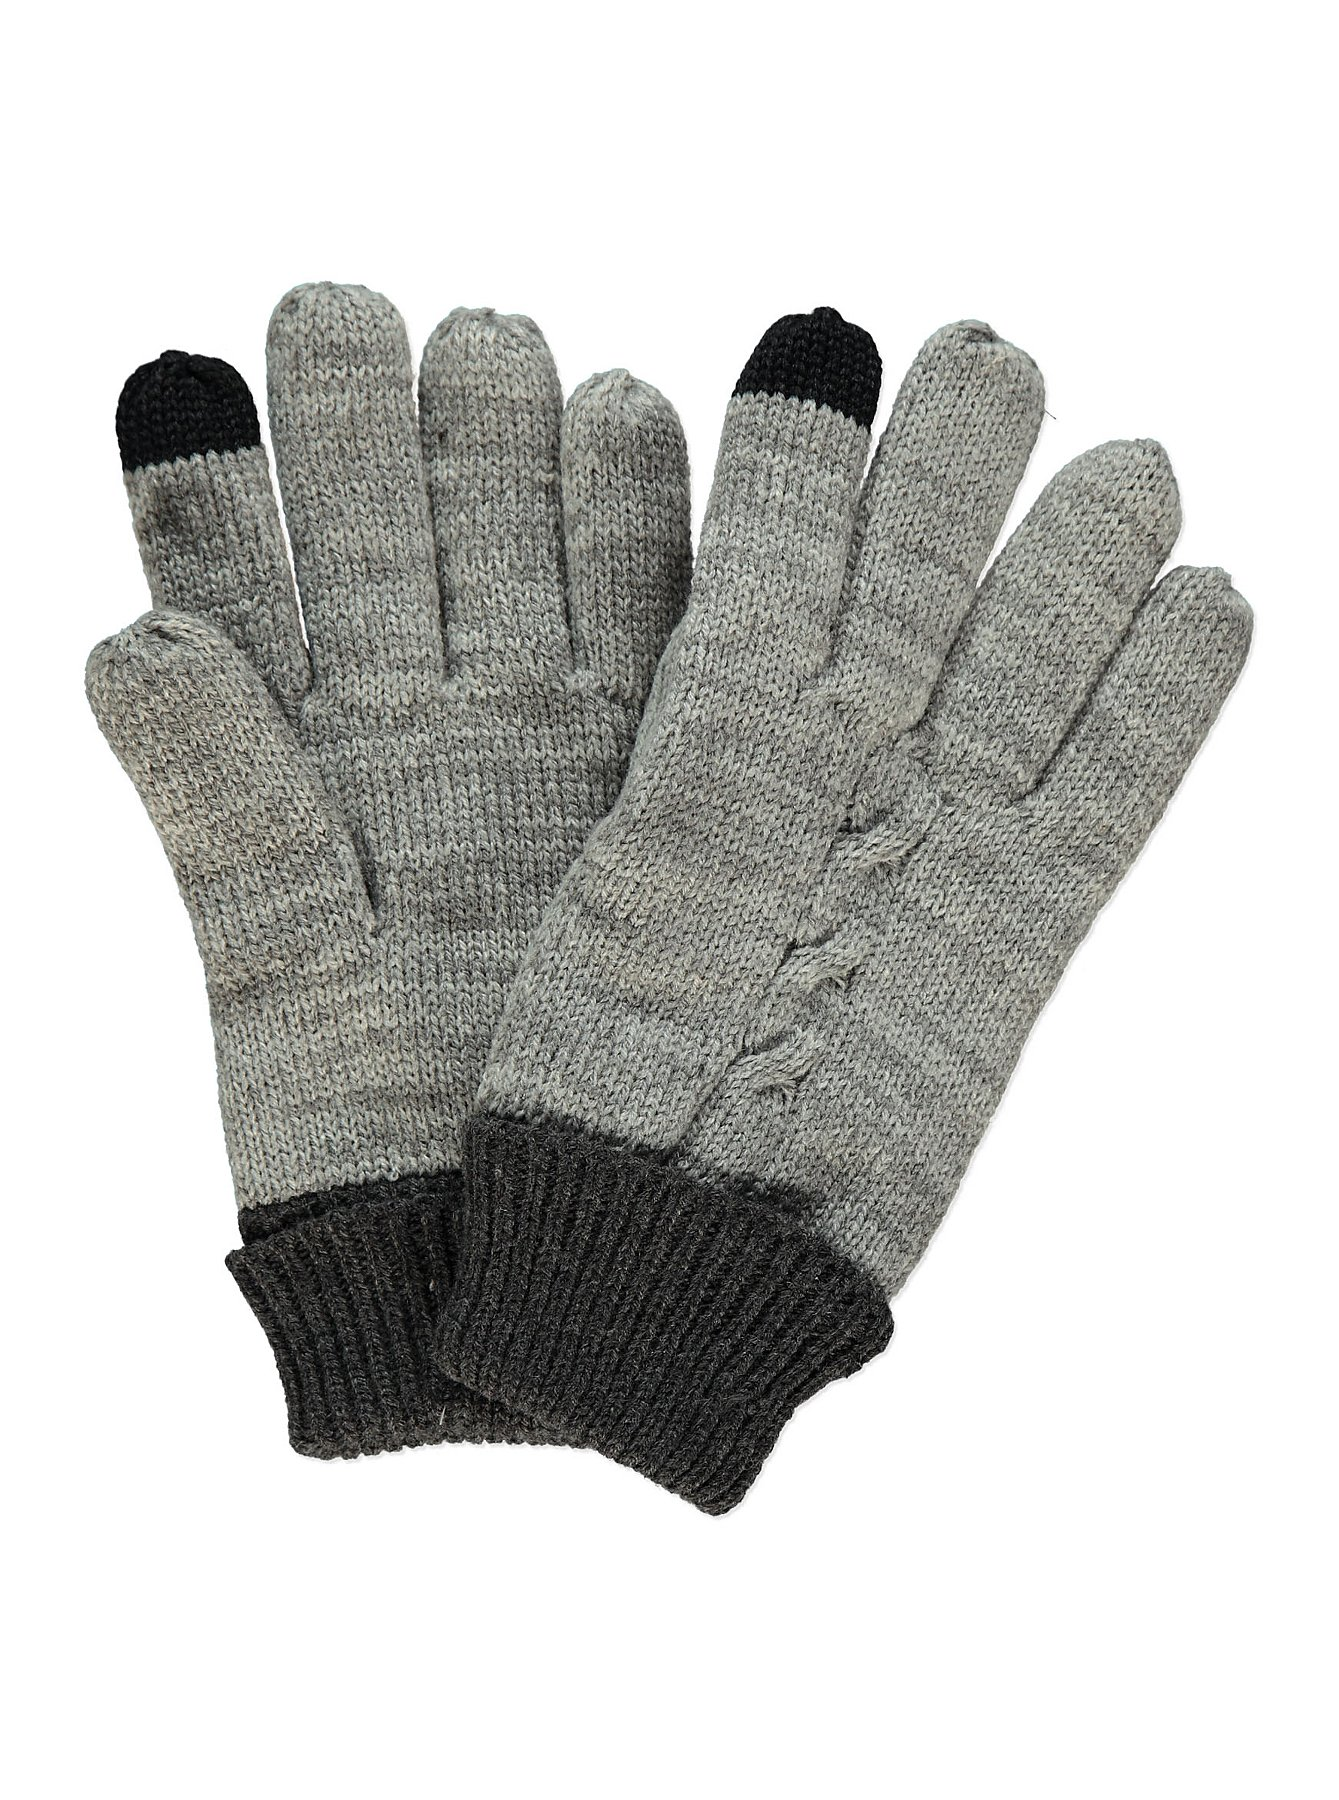 Ladies leather gloves asda - Ladies Leather Gloves Asda 8